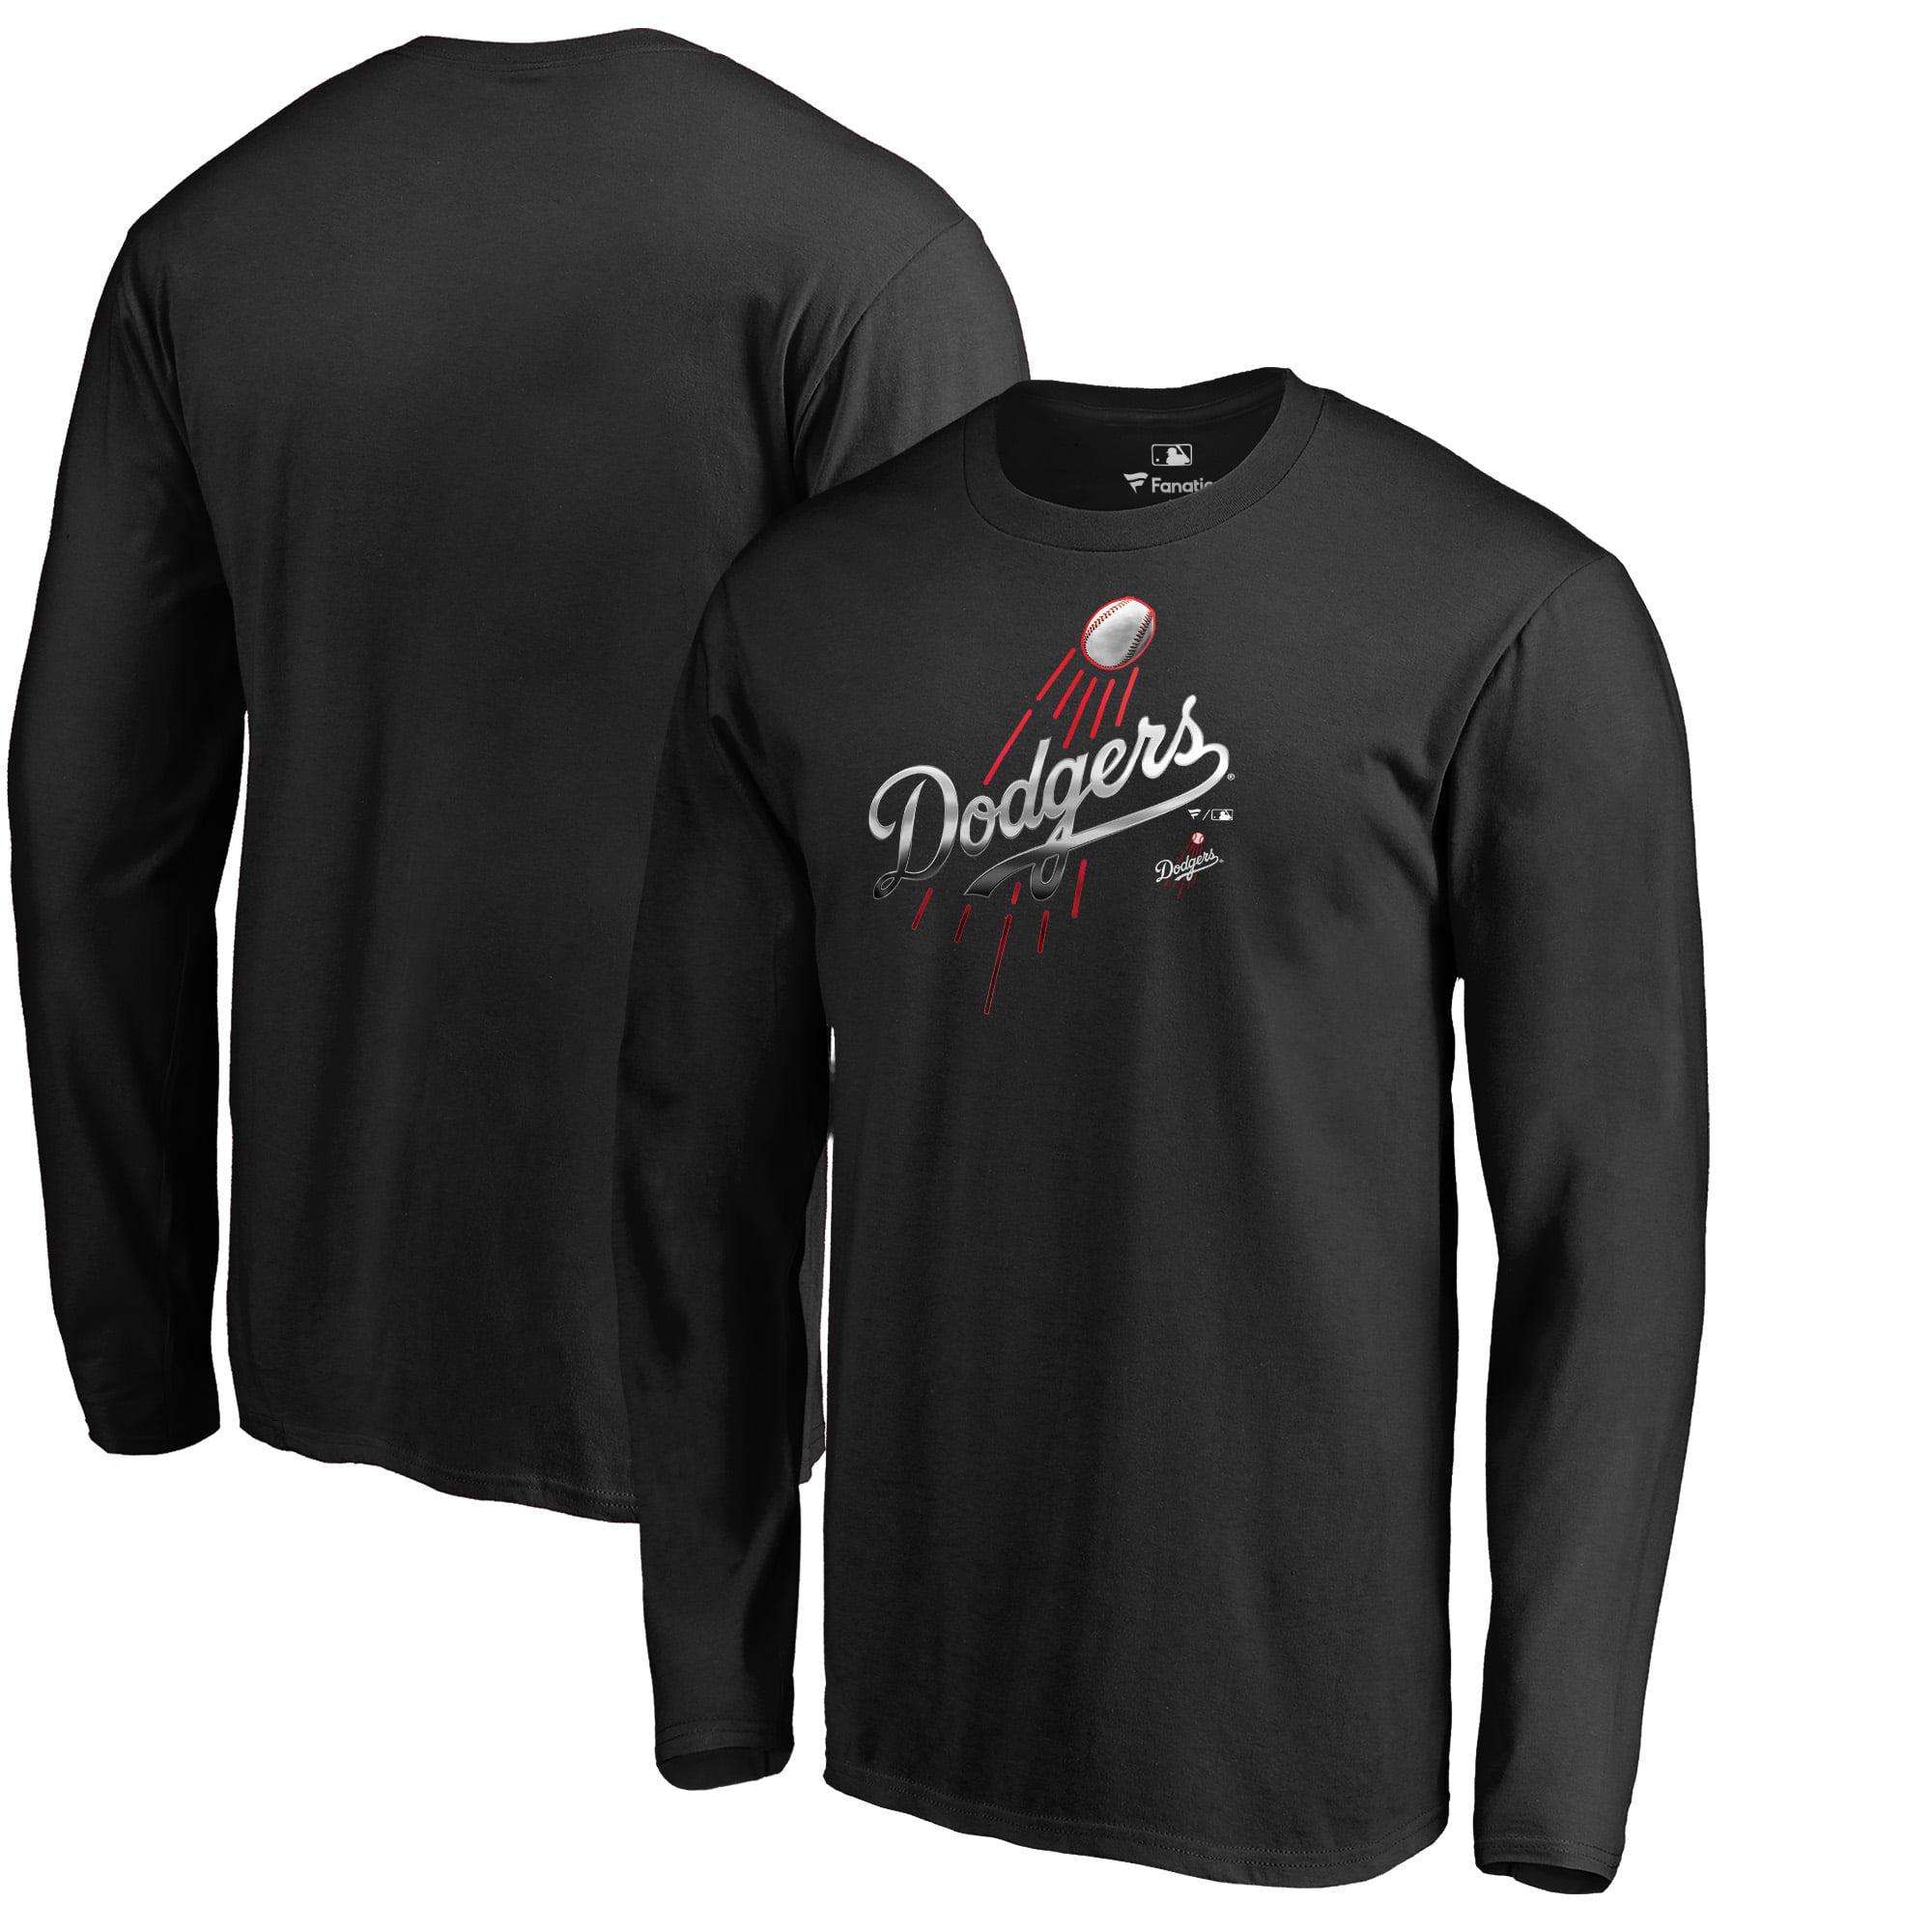 Los Angeles Dodgers Fanatics Branded Midnight Mascot Long Sleeve T-Shirt - Black